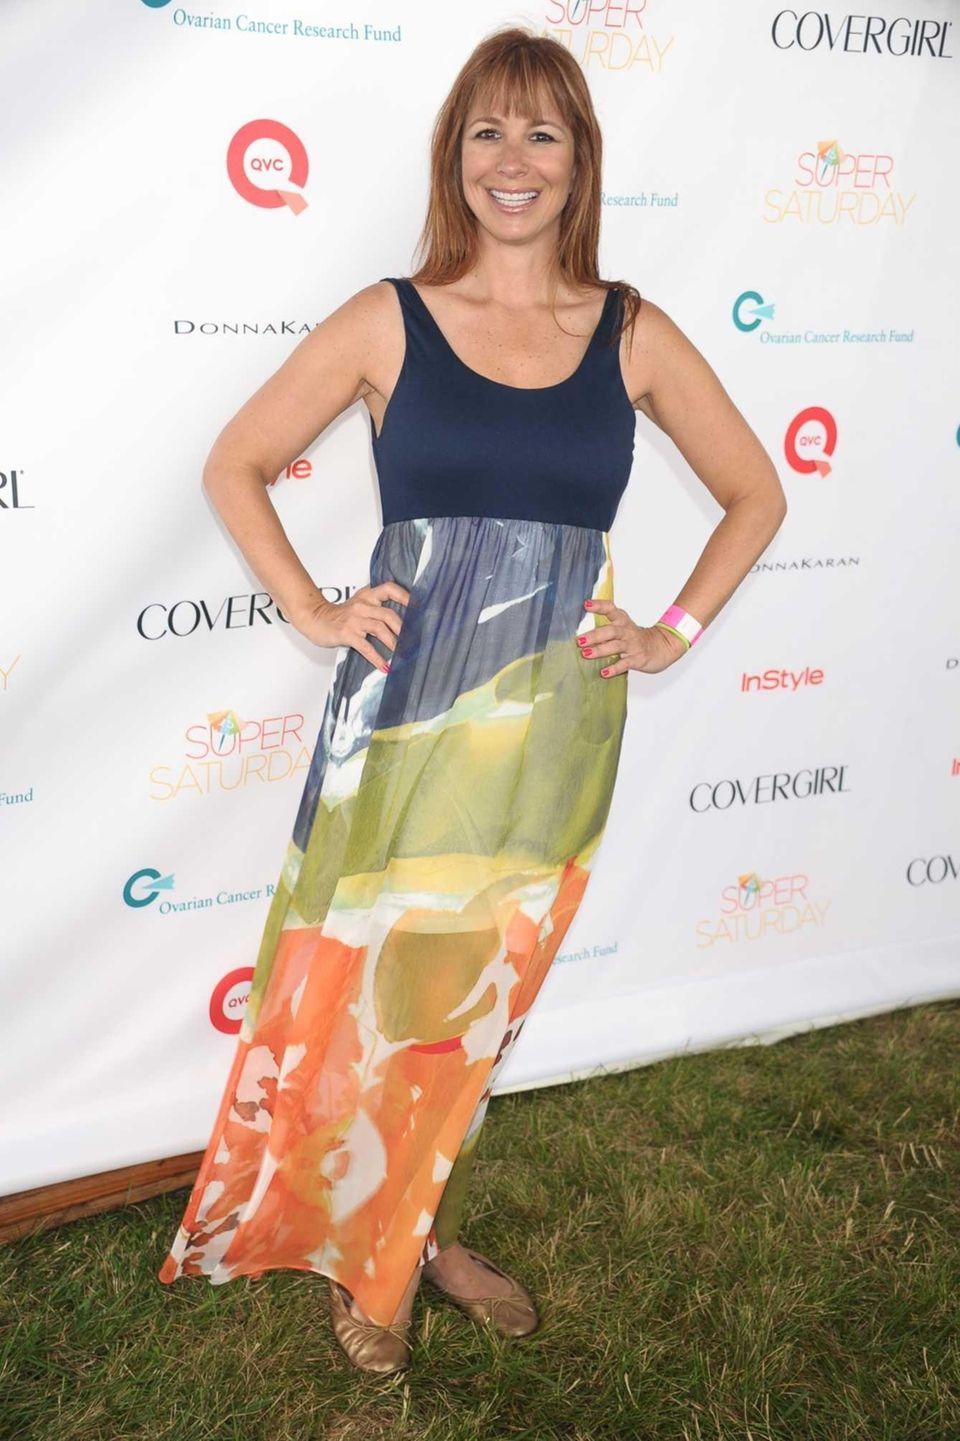 Jill Zarin attends Super Saturday 15 to benefit